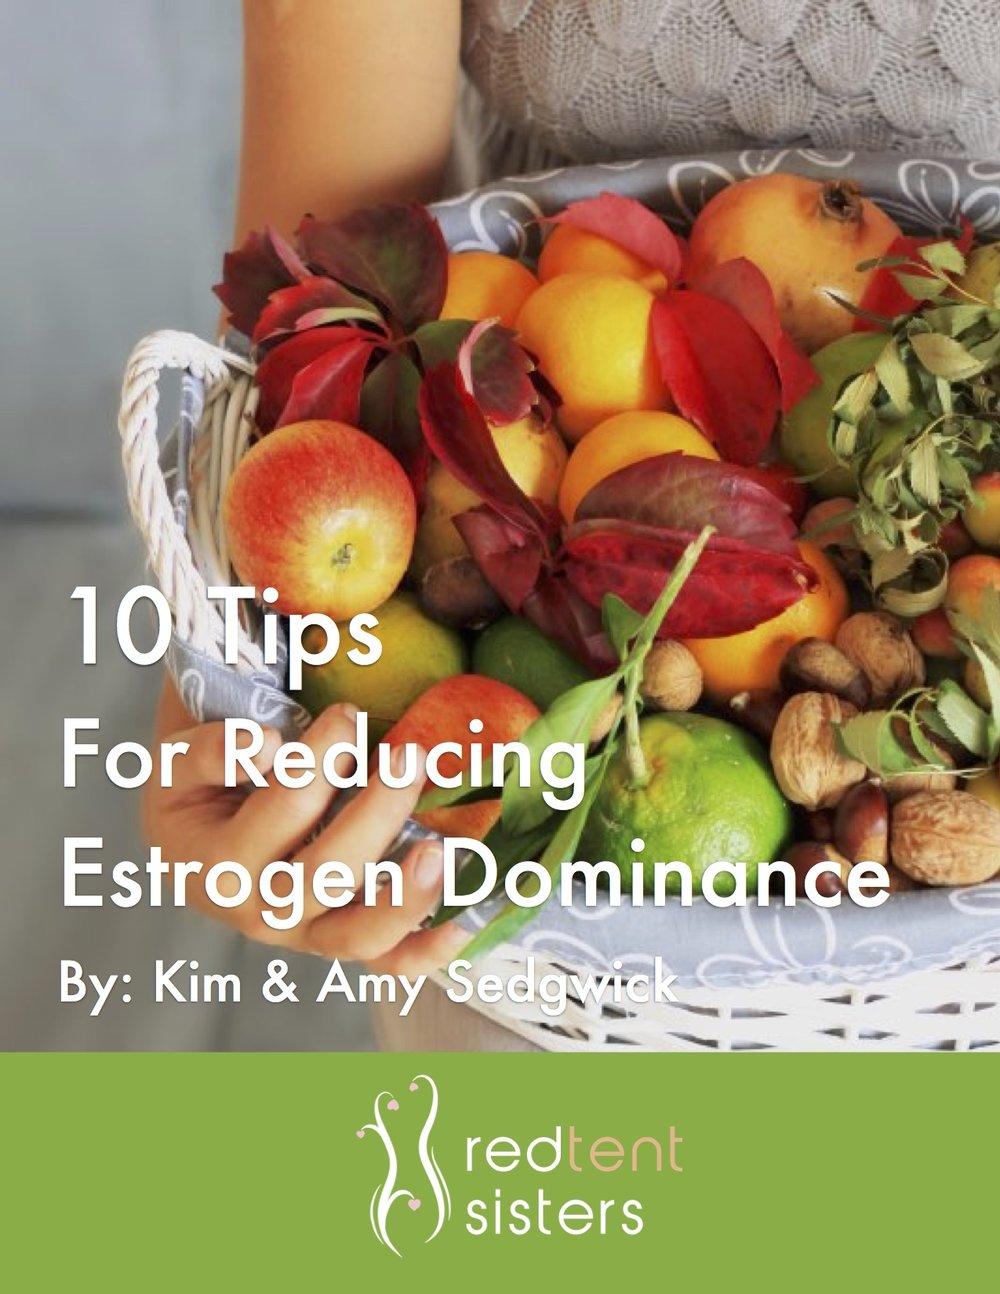 Estrogen Dominance (dragged).jpg